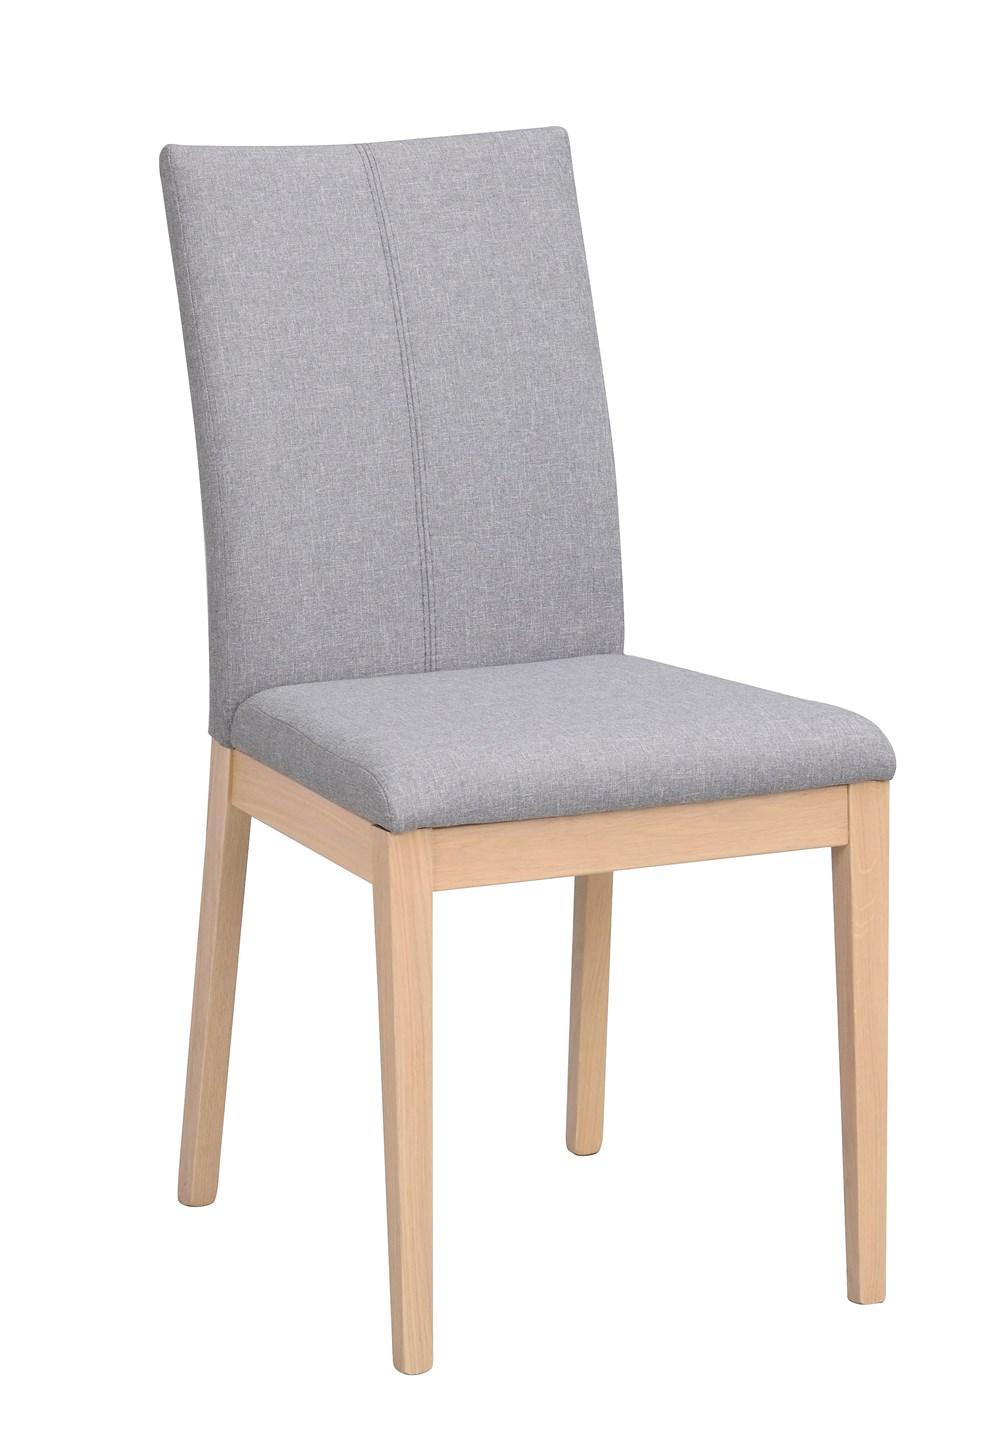 Amanda tuoli vaaleanharmaa/valkopesty tammi, Rowico